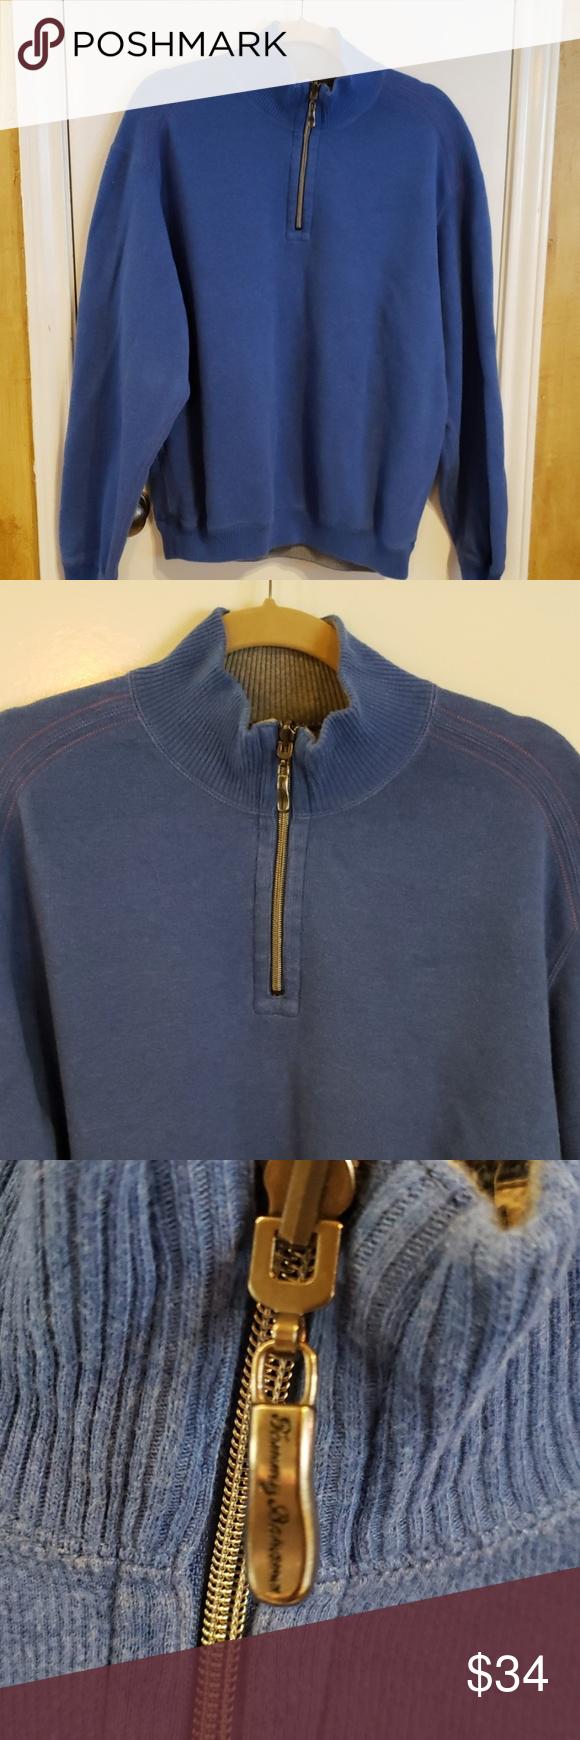 Tommy Bahama Mens Sweatshirt Zip Up Tommy Bahama Super Soft Sweatshirt With Red Stitching 100 Soft Cotton T Tommy Bahama Mens Mens Sweatshirts Tommy Bahama [ 1740 x 580 Pixel ]